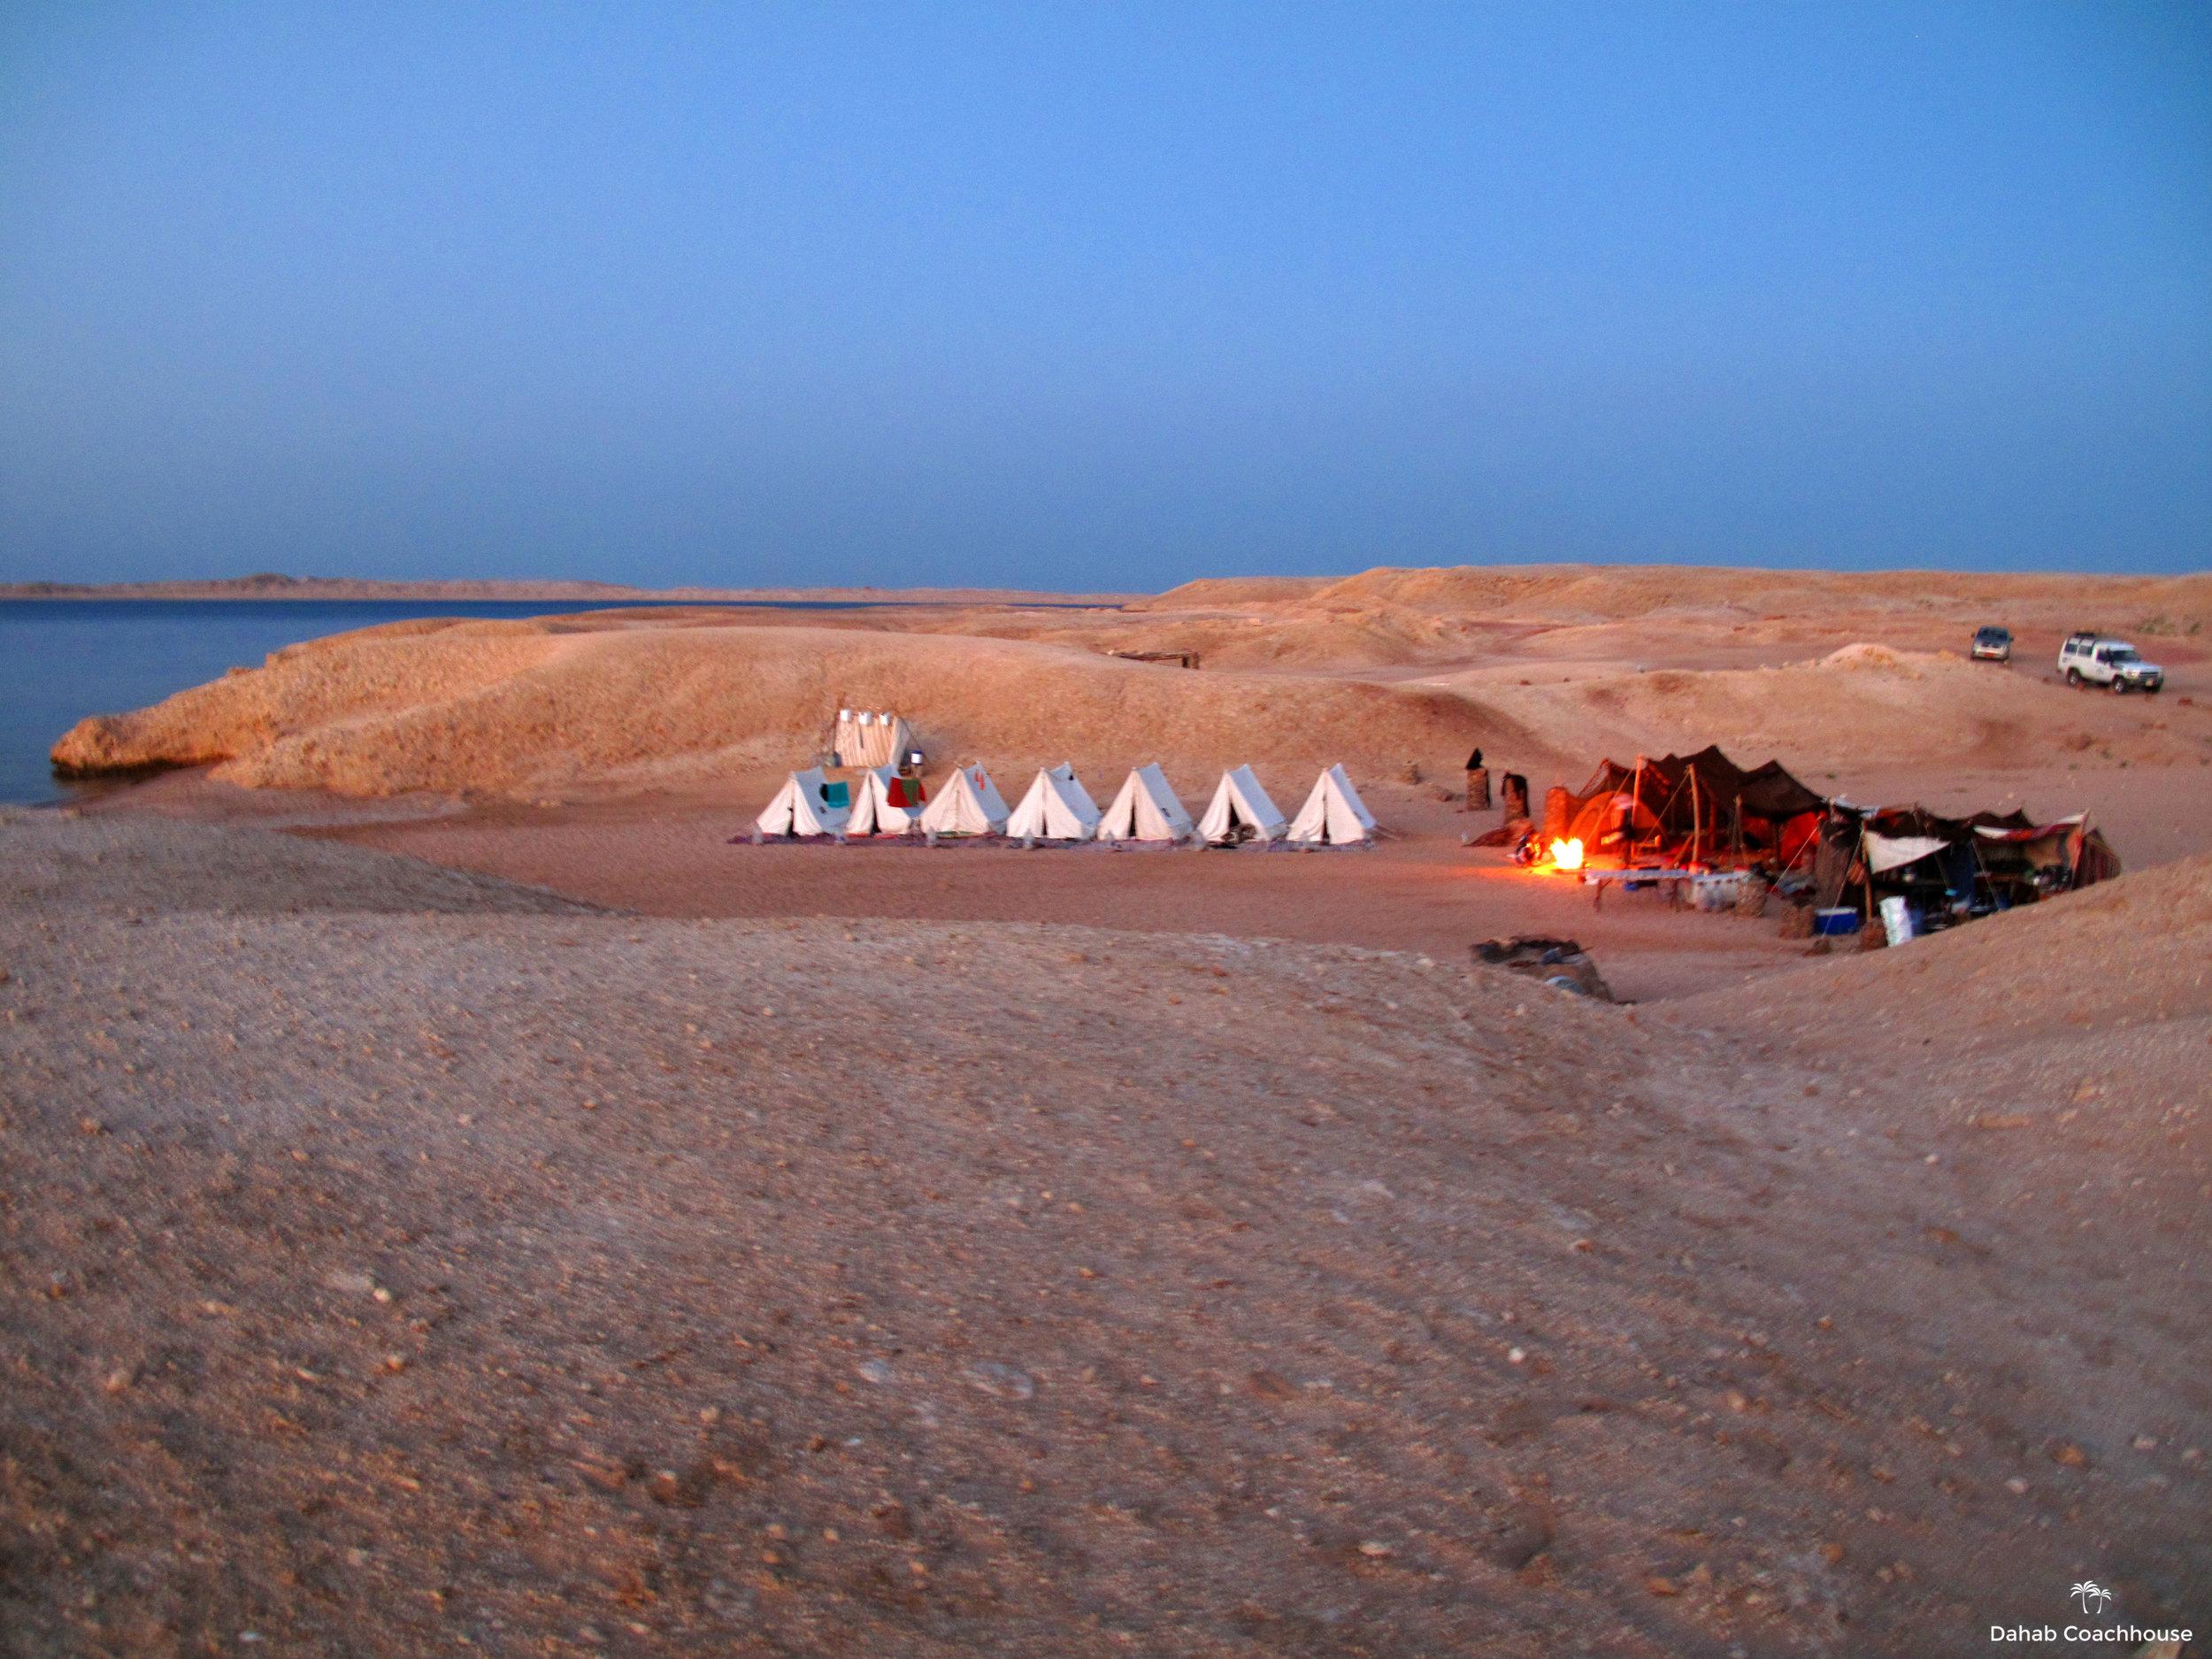 Dahab_Coachhouse_Sinai_Egypt_Dahab_Ras_Mohammed_Camping.JPG